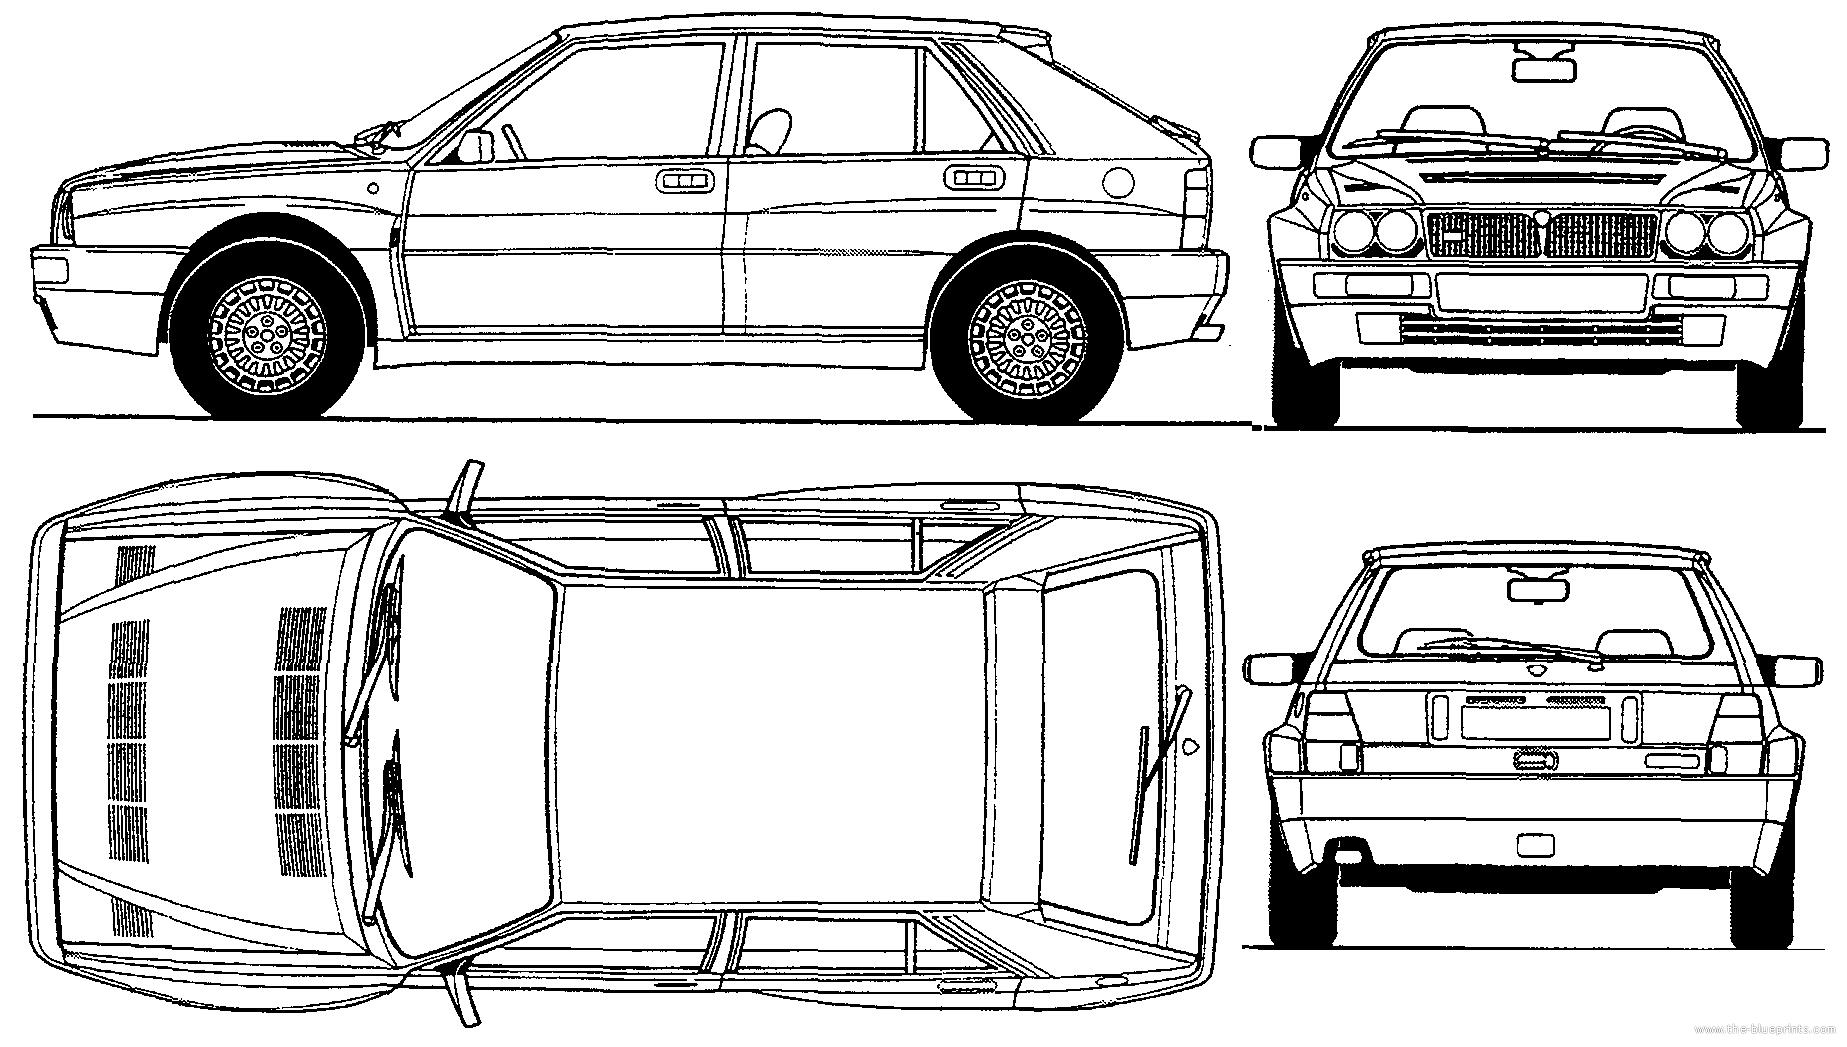 Blueprints > Cars > Lancia > Lancia Delta HF Integrale (1993)